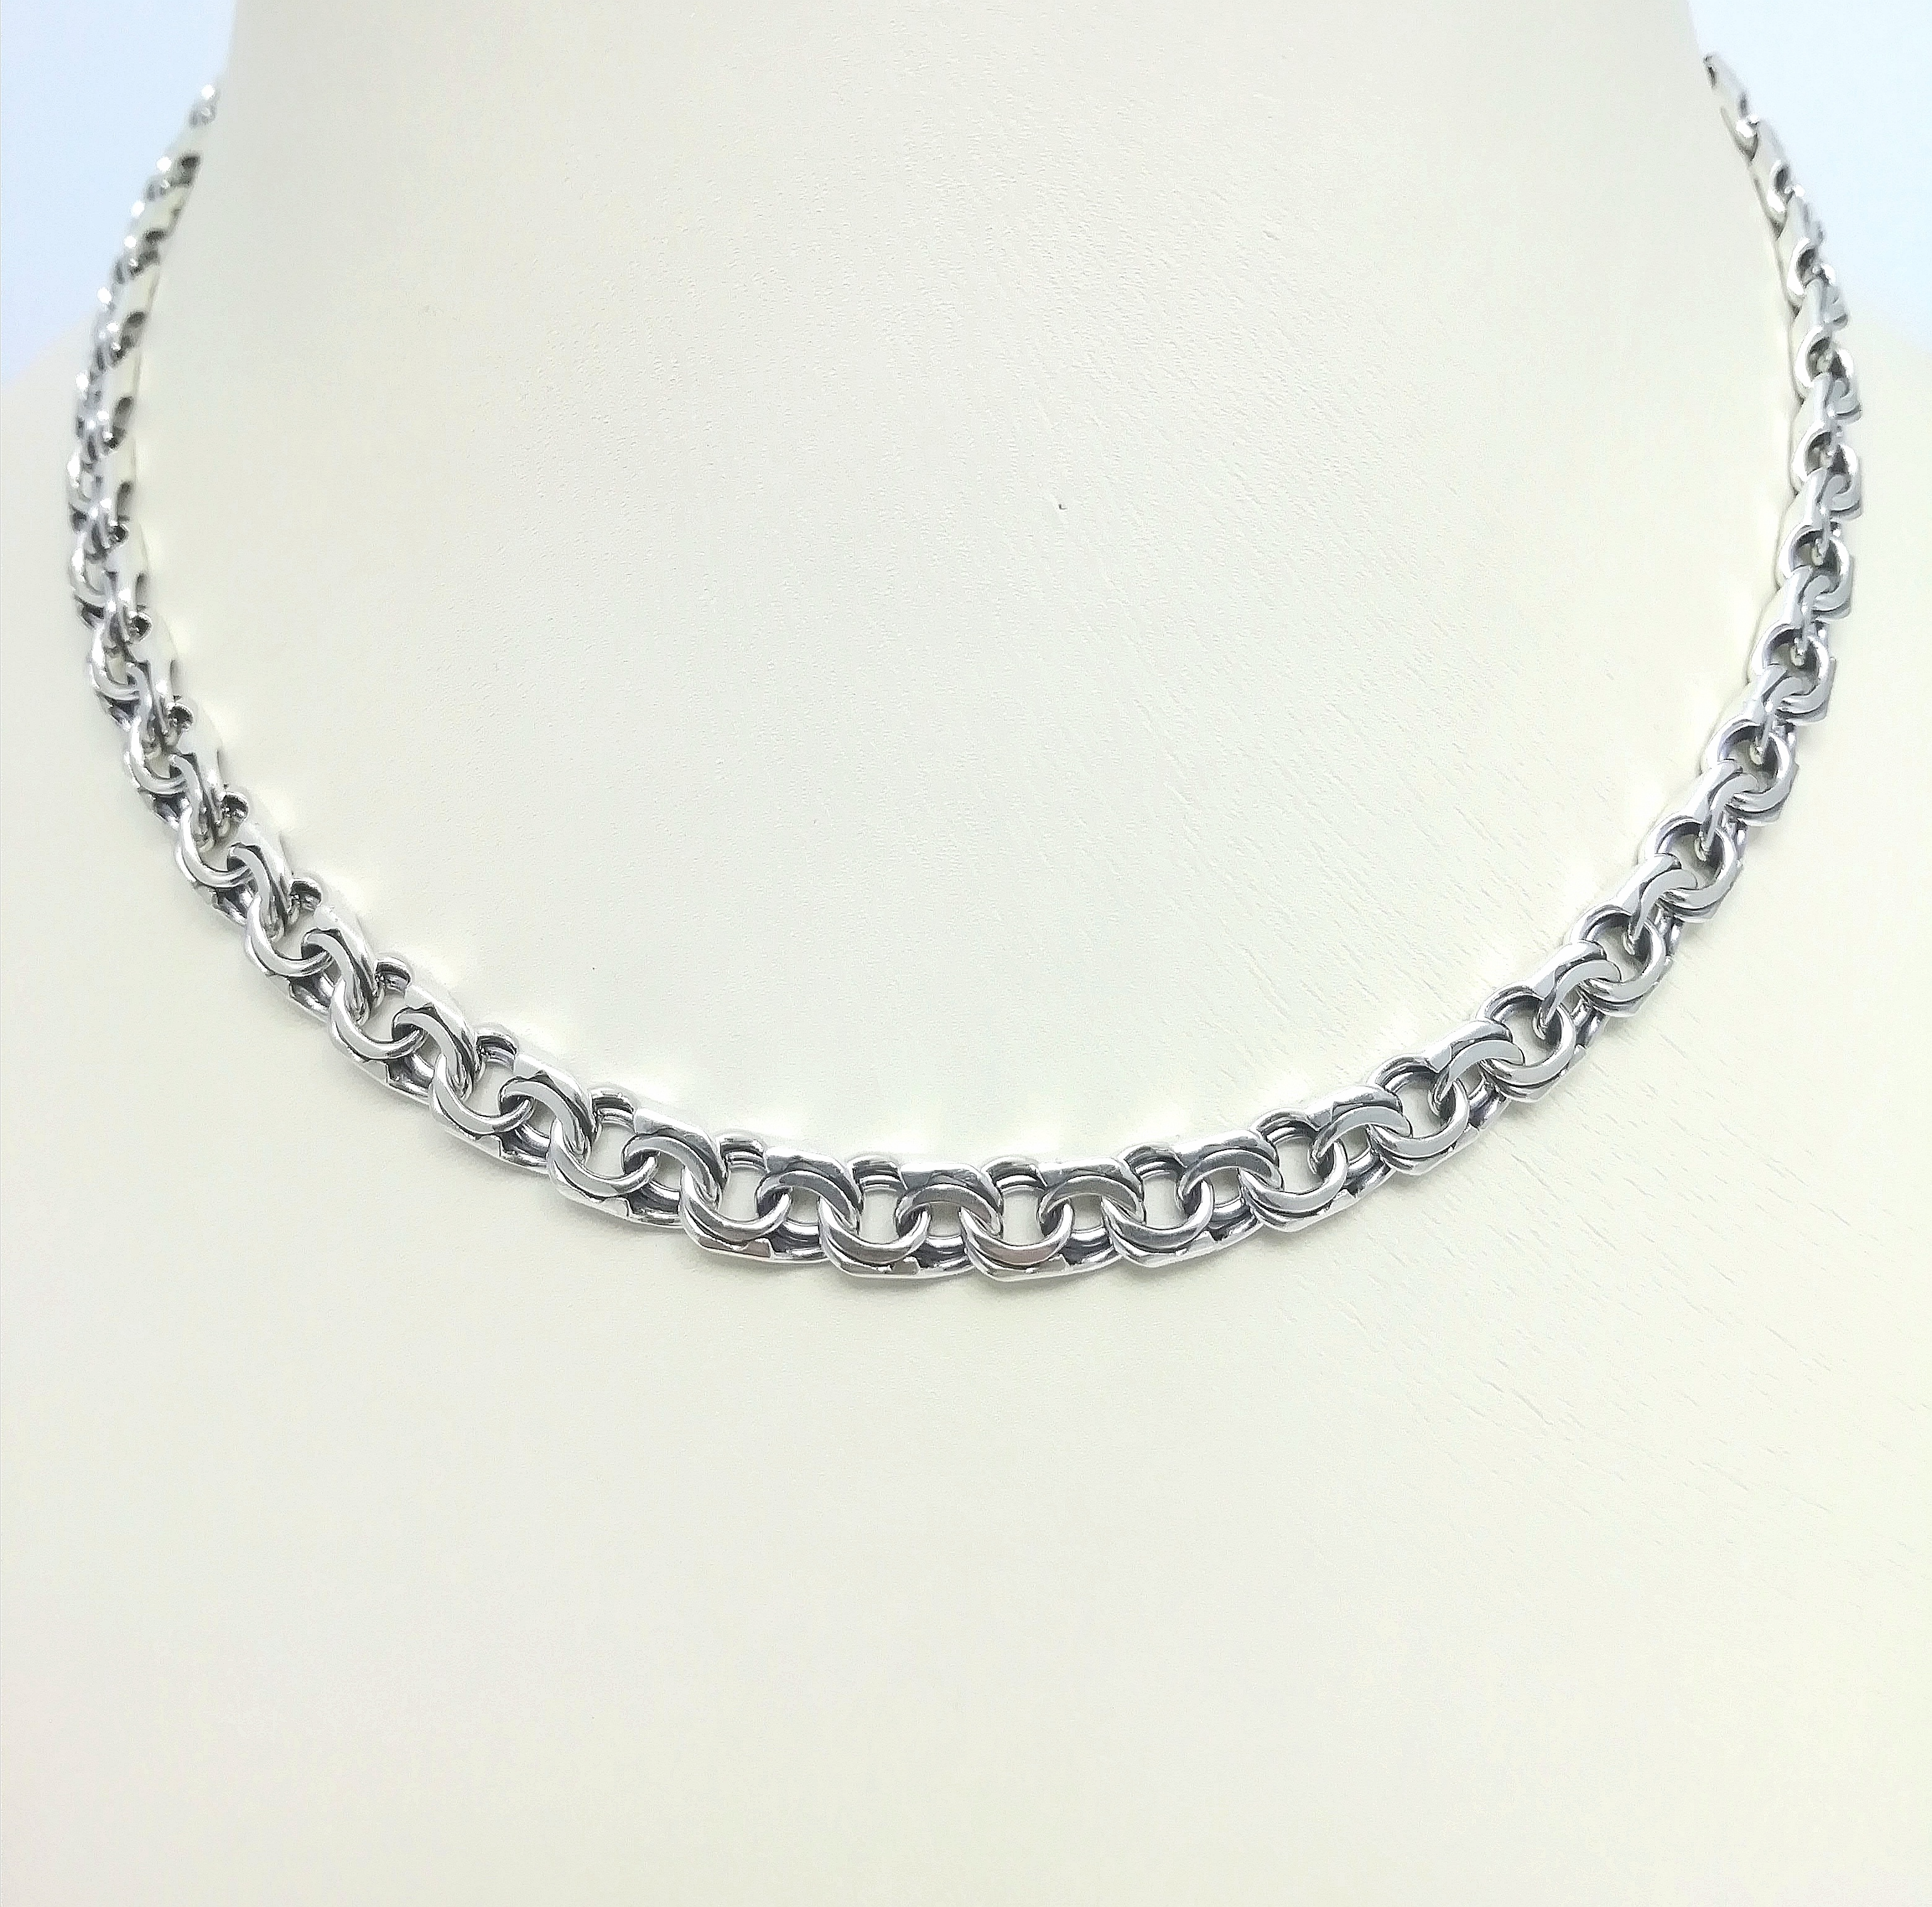 Серебро цепь дк240920-144 32,50гр